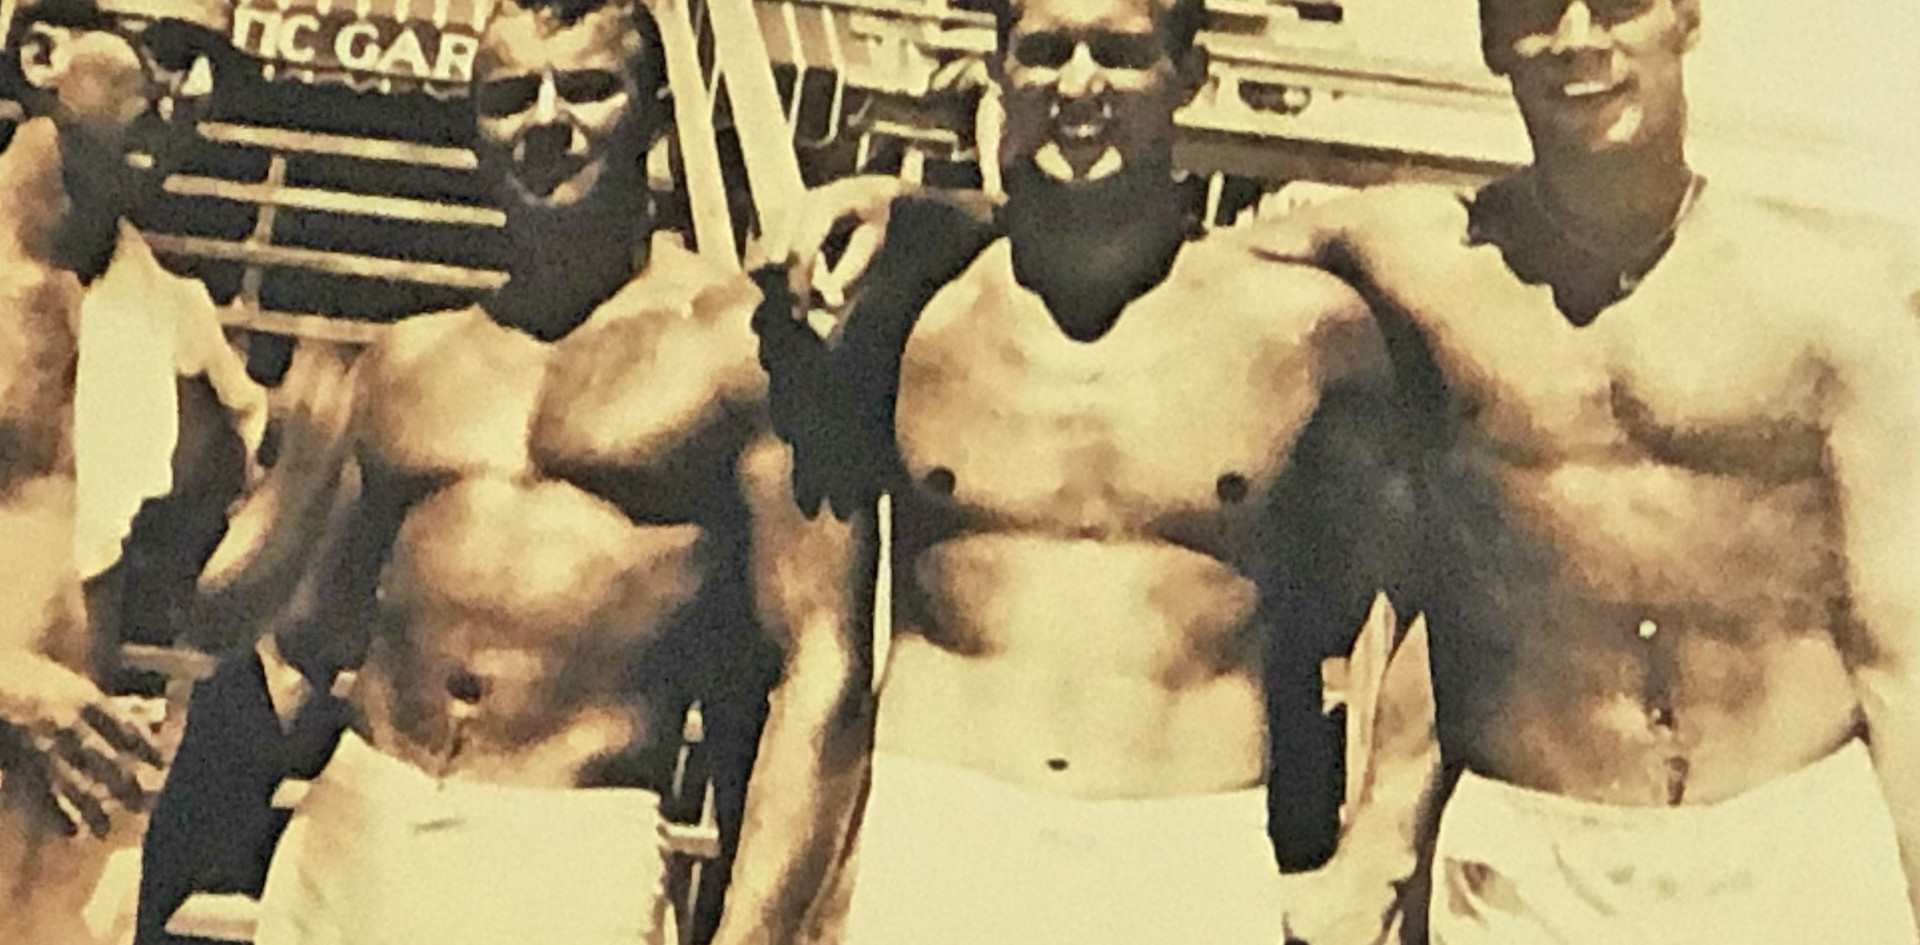 Mr. Joe Regan, Mr. Jack Kelly and the Ocean City Fellas, 2020